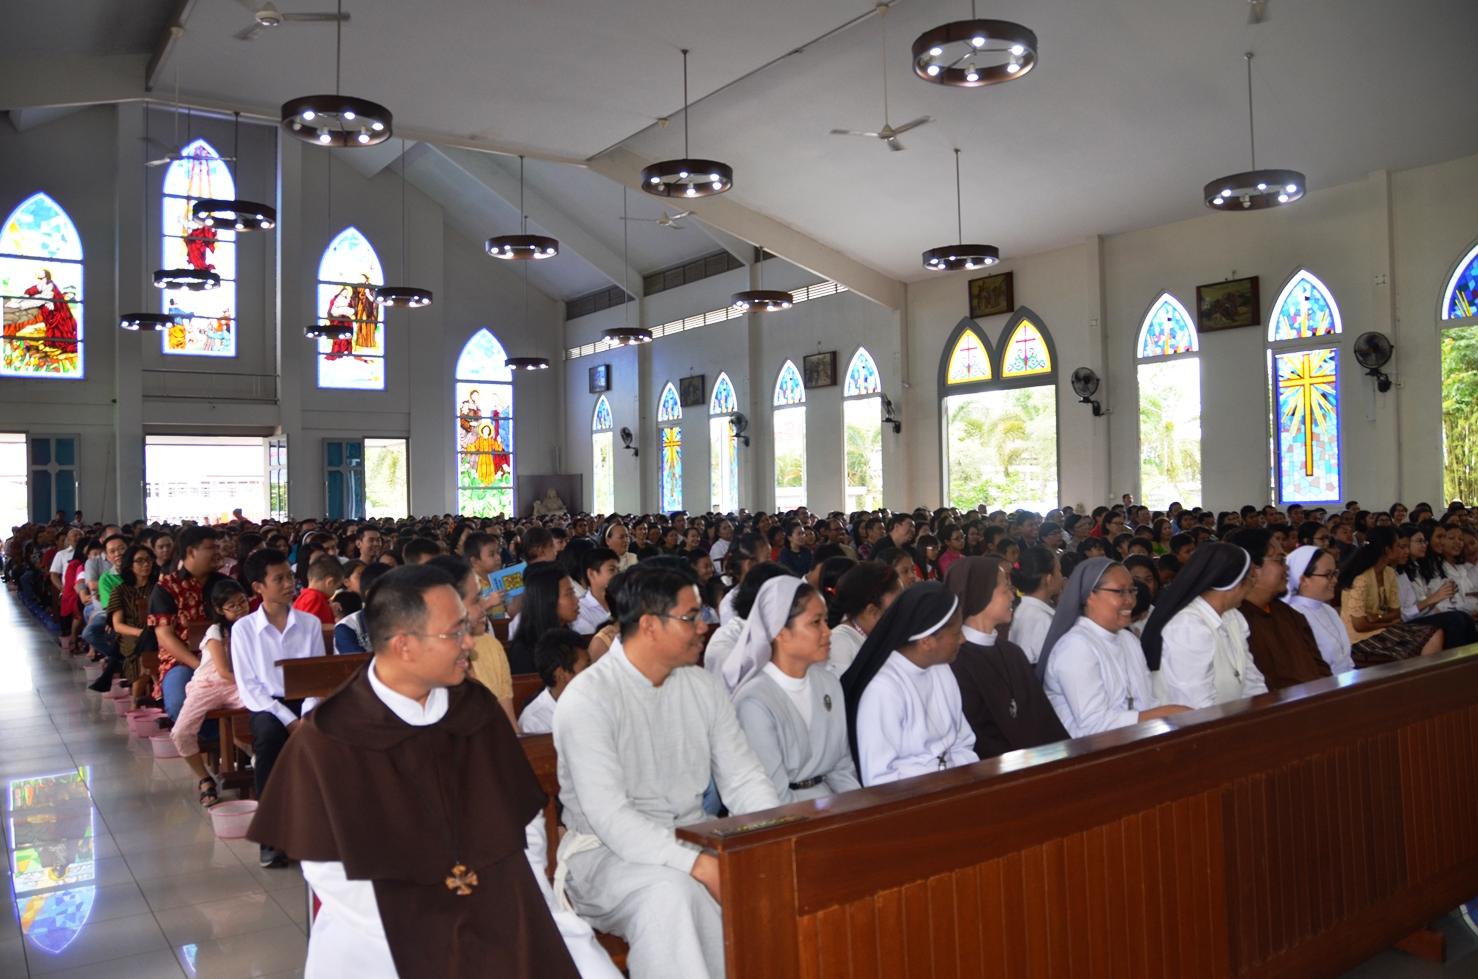 Parrocchia della Sacra Famiglia a Kota Baru, Pontianak (West Kalimantan) 09